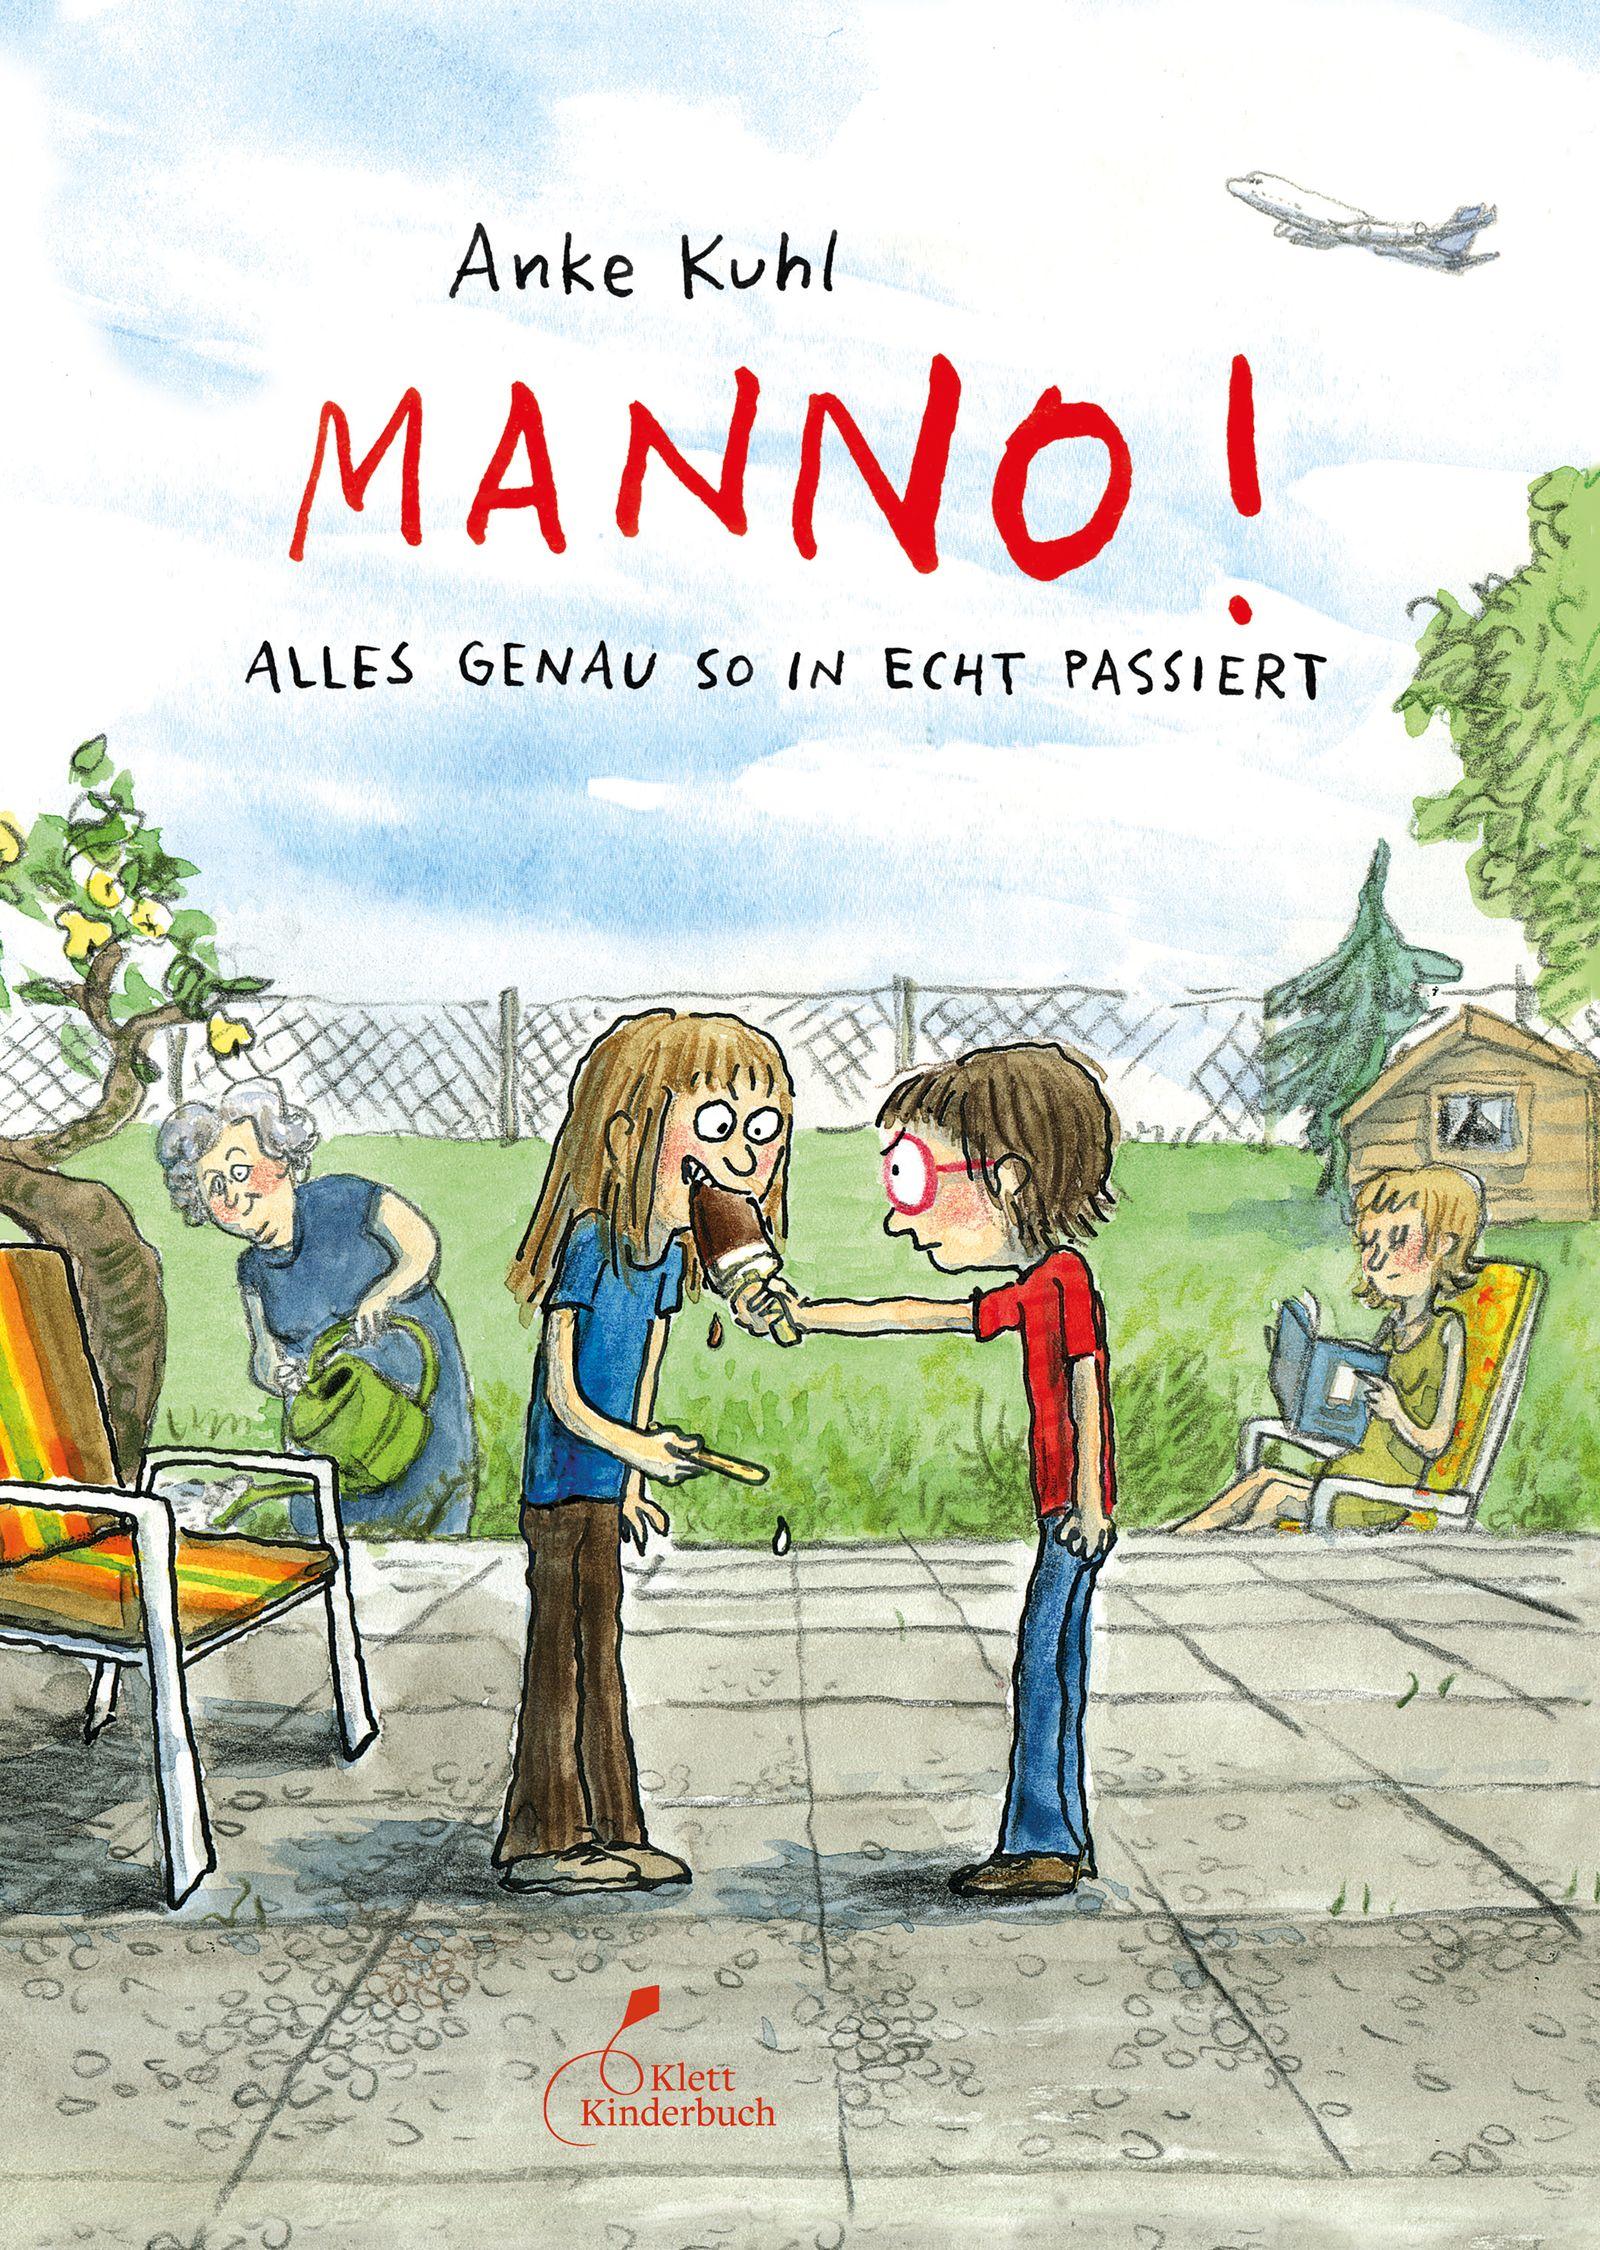 Kinderbücher/ Anke Kuhl: Manno! Alles genau so passiert COVER